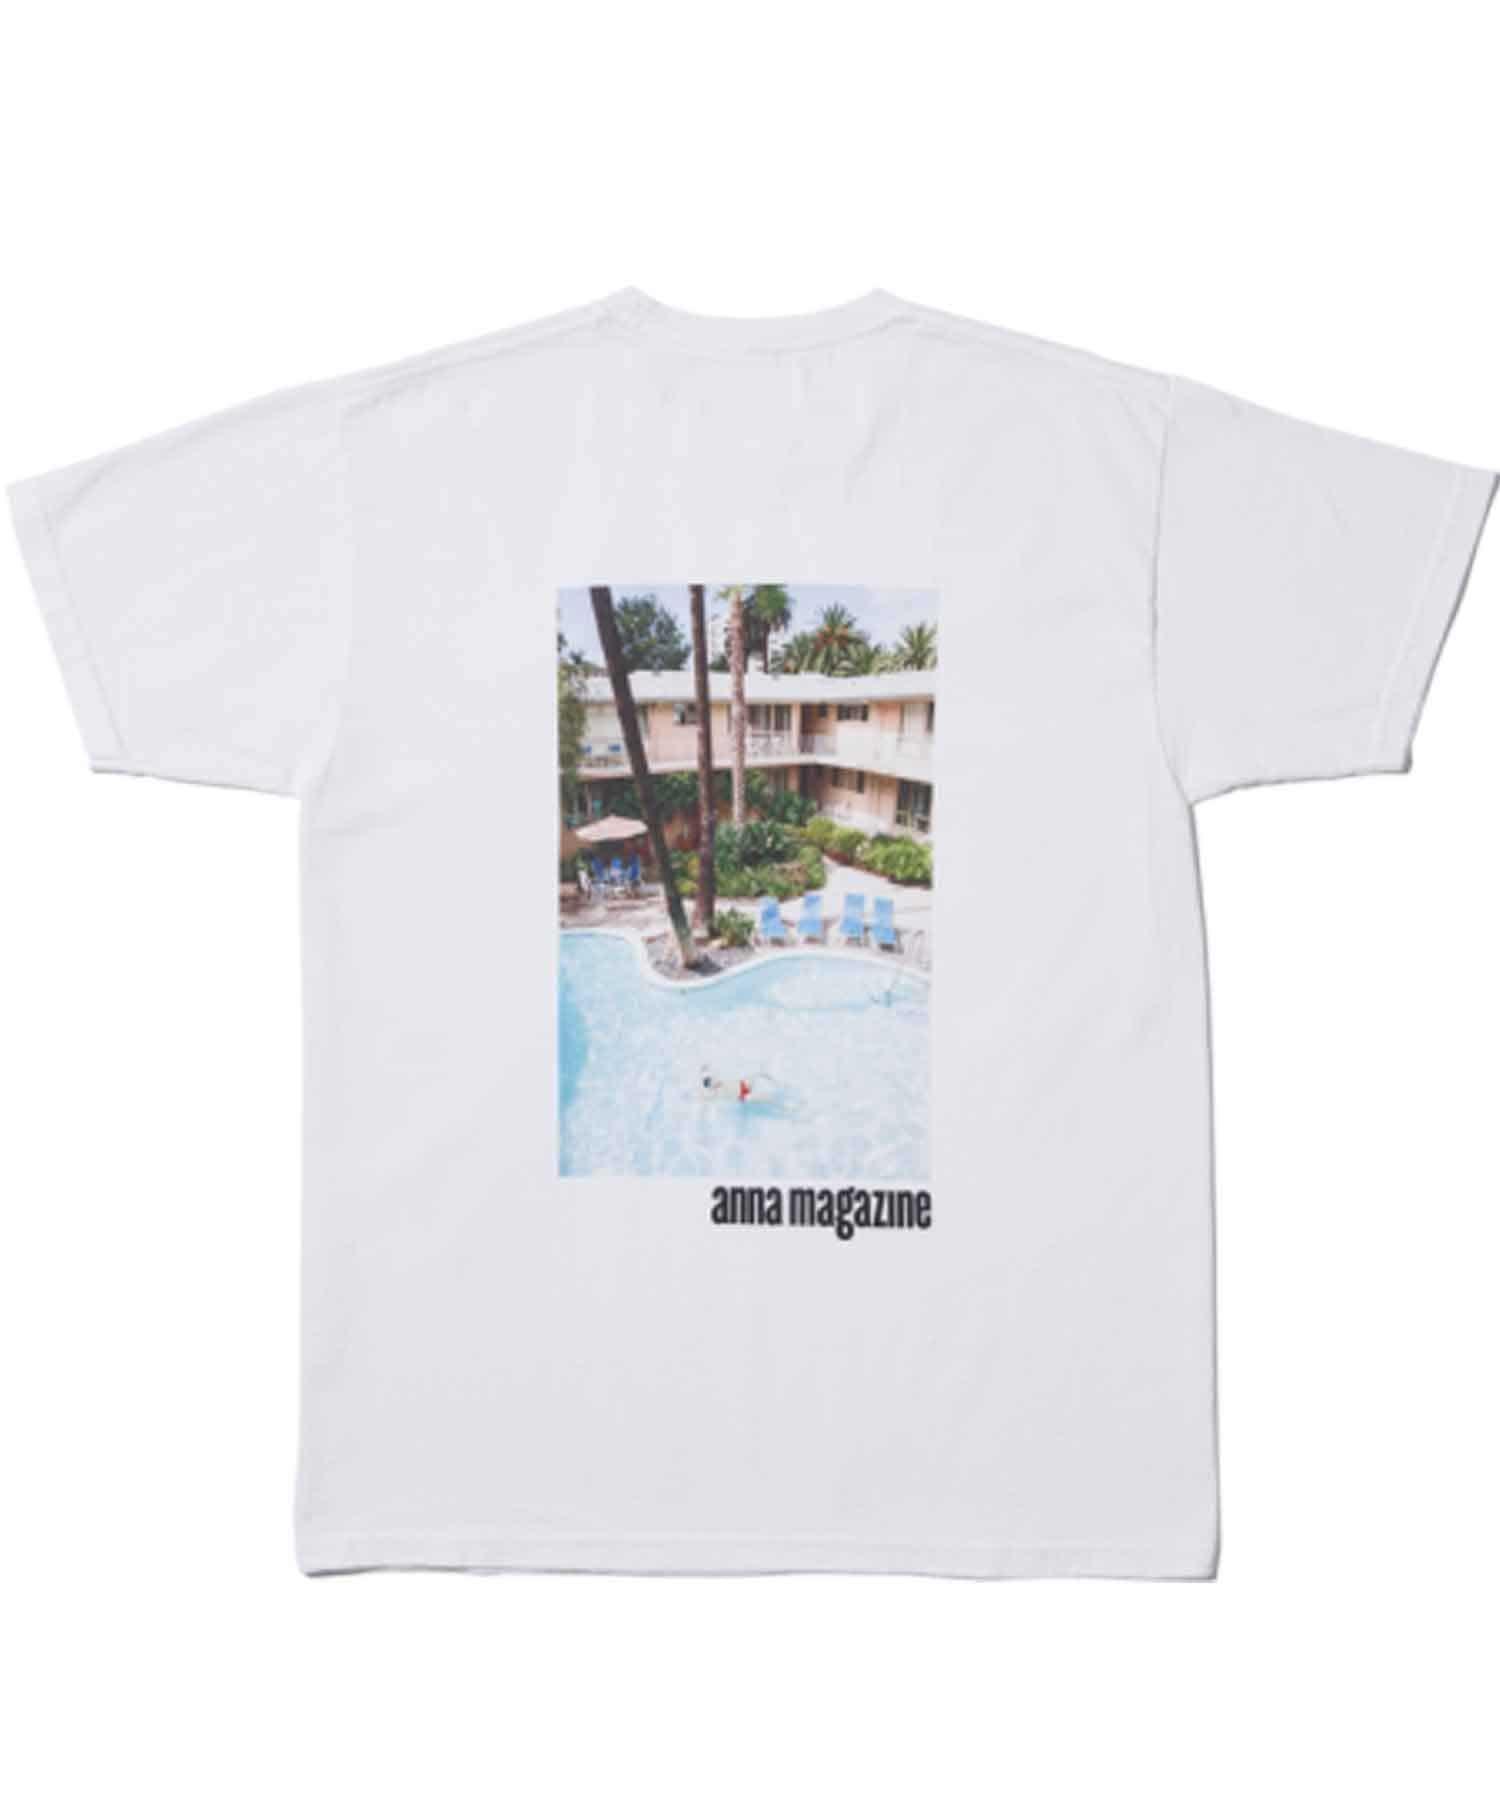 TERRITOIRE(テリトワール) 【FRUIT OF THE LOOM】ANNAMAGAZINW Tシャツ